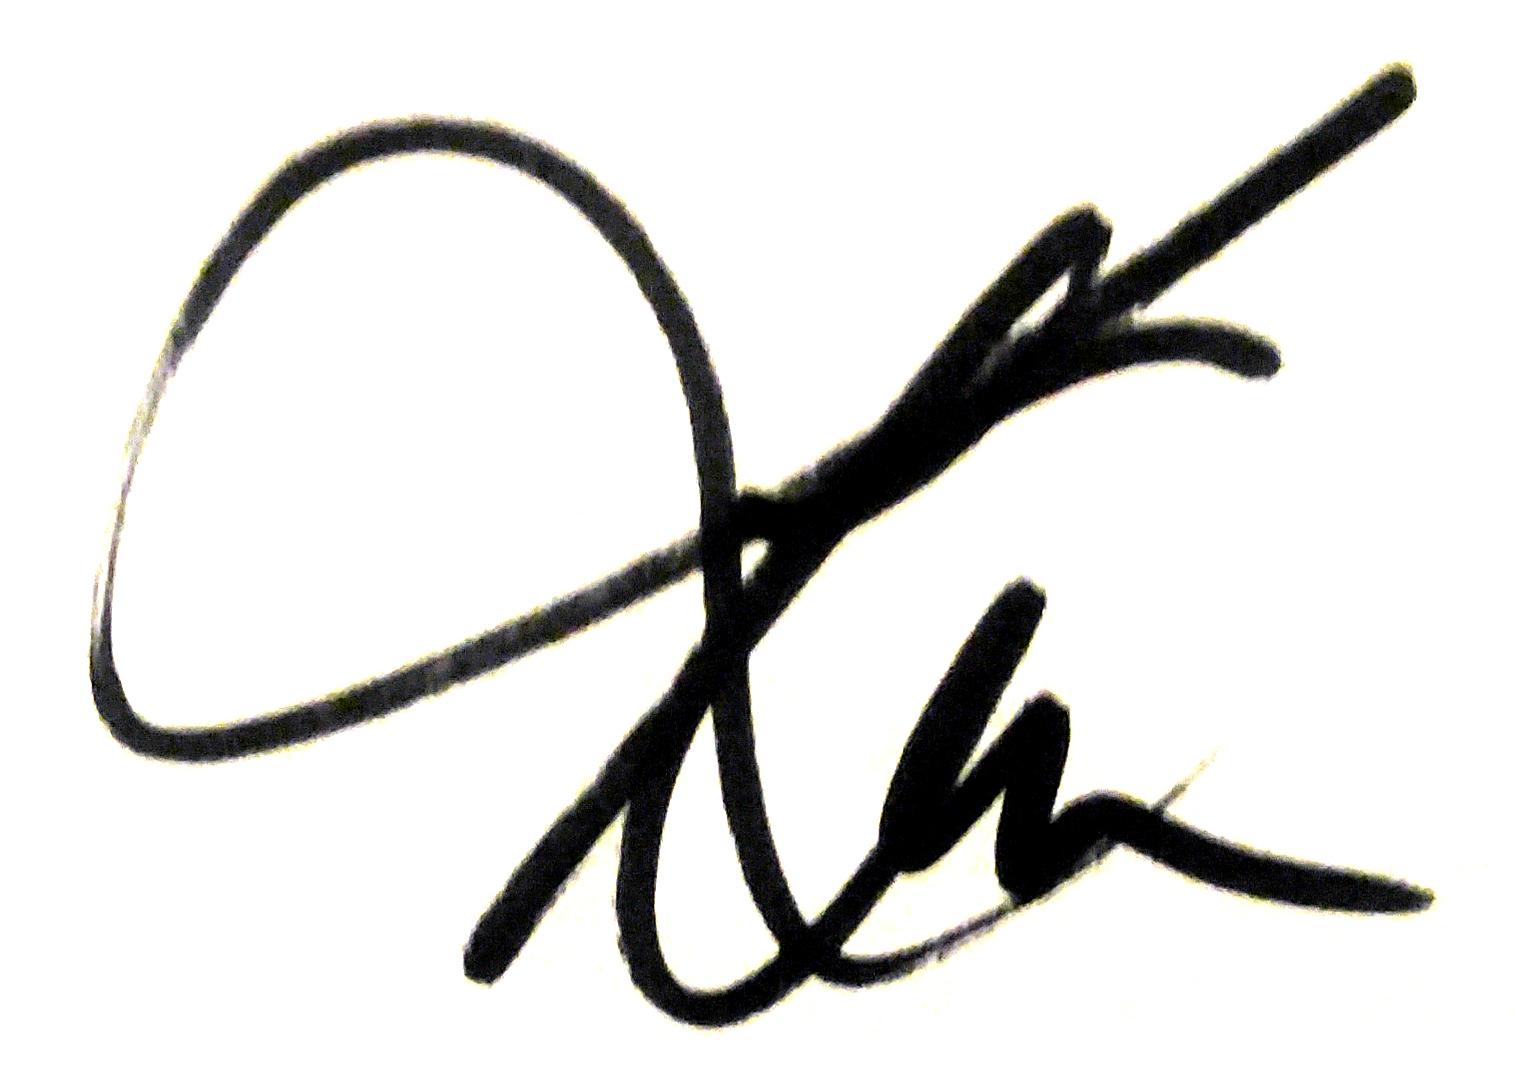 Keith McCrea's Signature